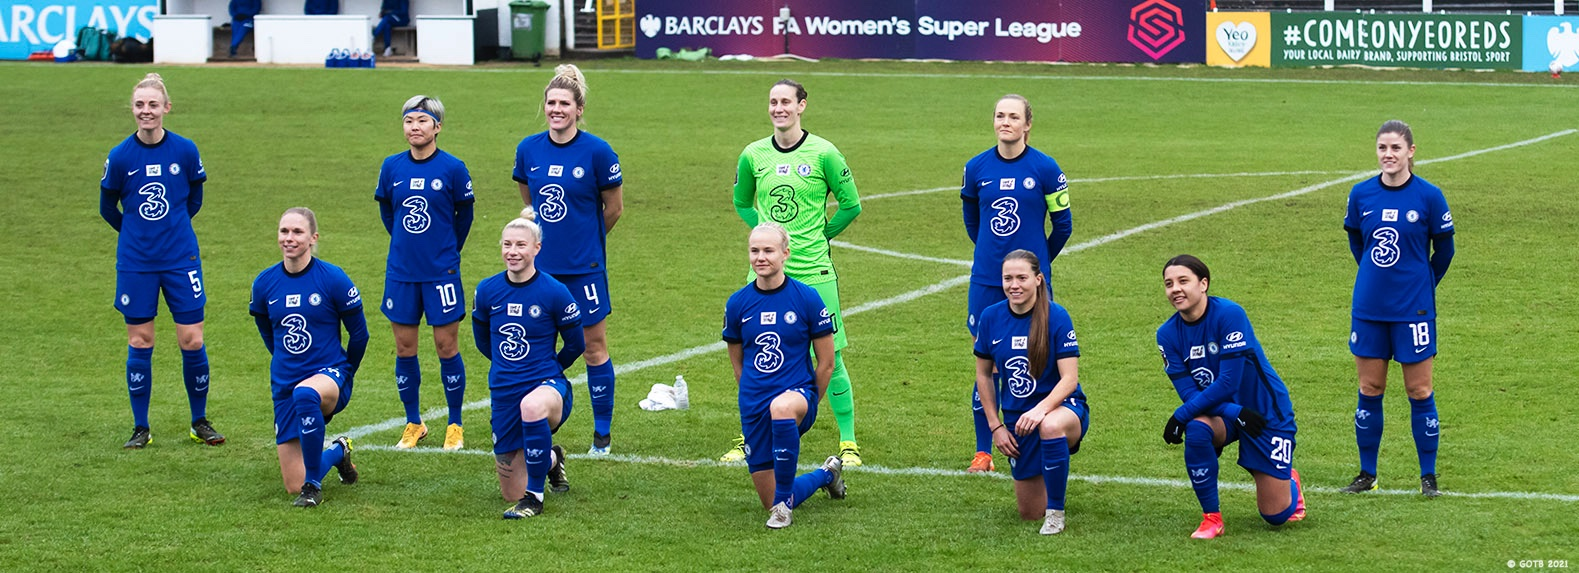 Bristol City v Chelsea, FAWSL